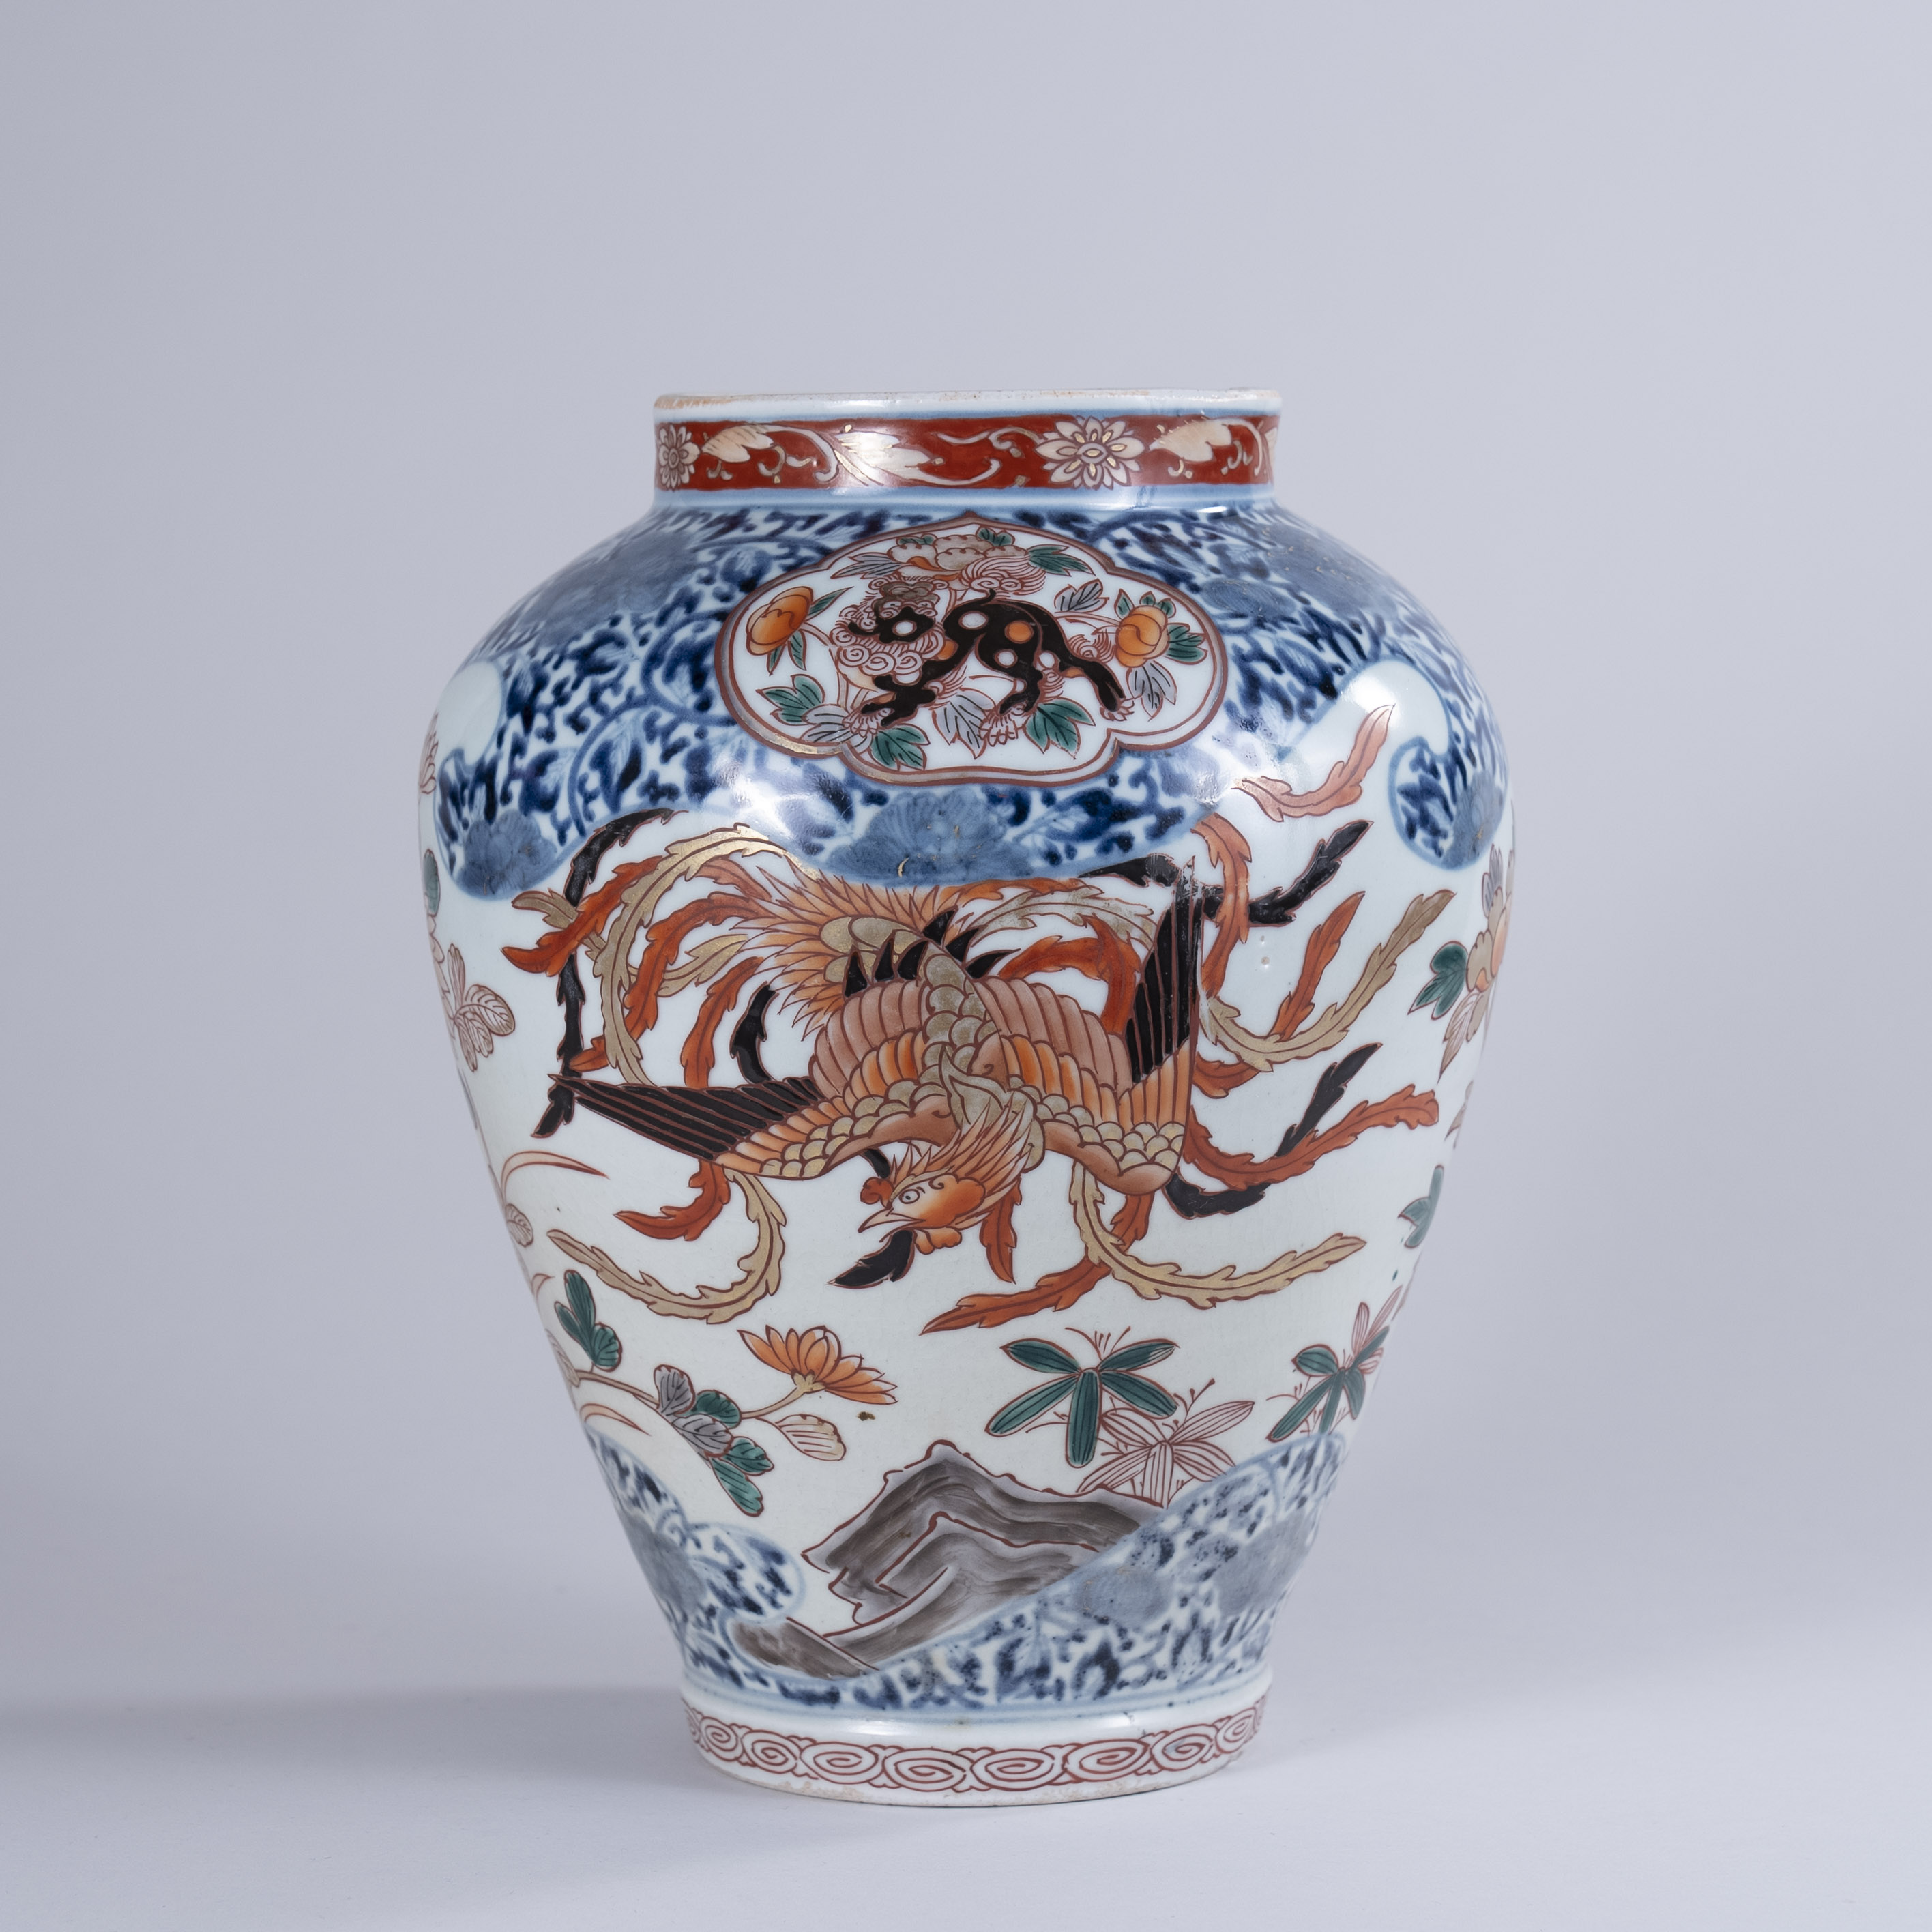 Early 18th centuryJapanese Imari Porcelain Vase as a Lamp